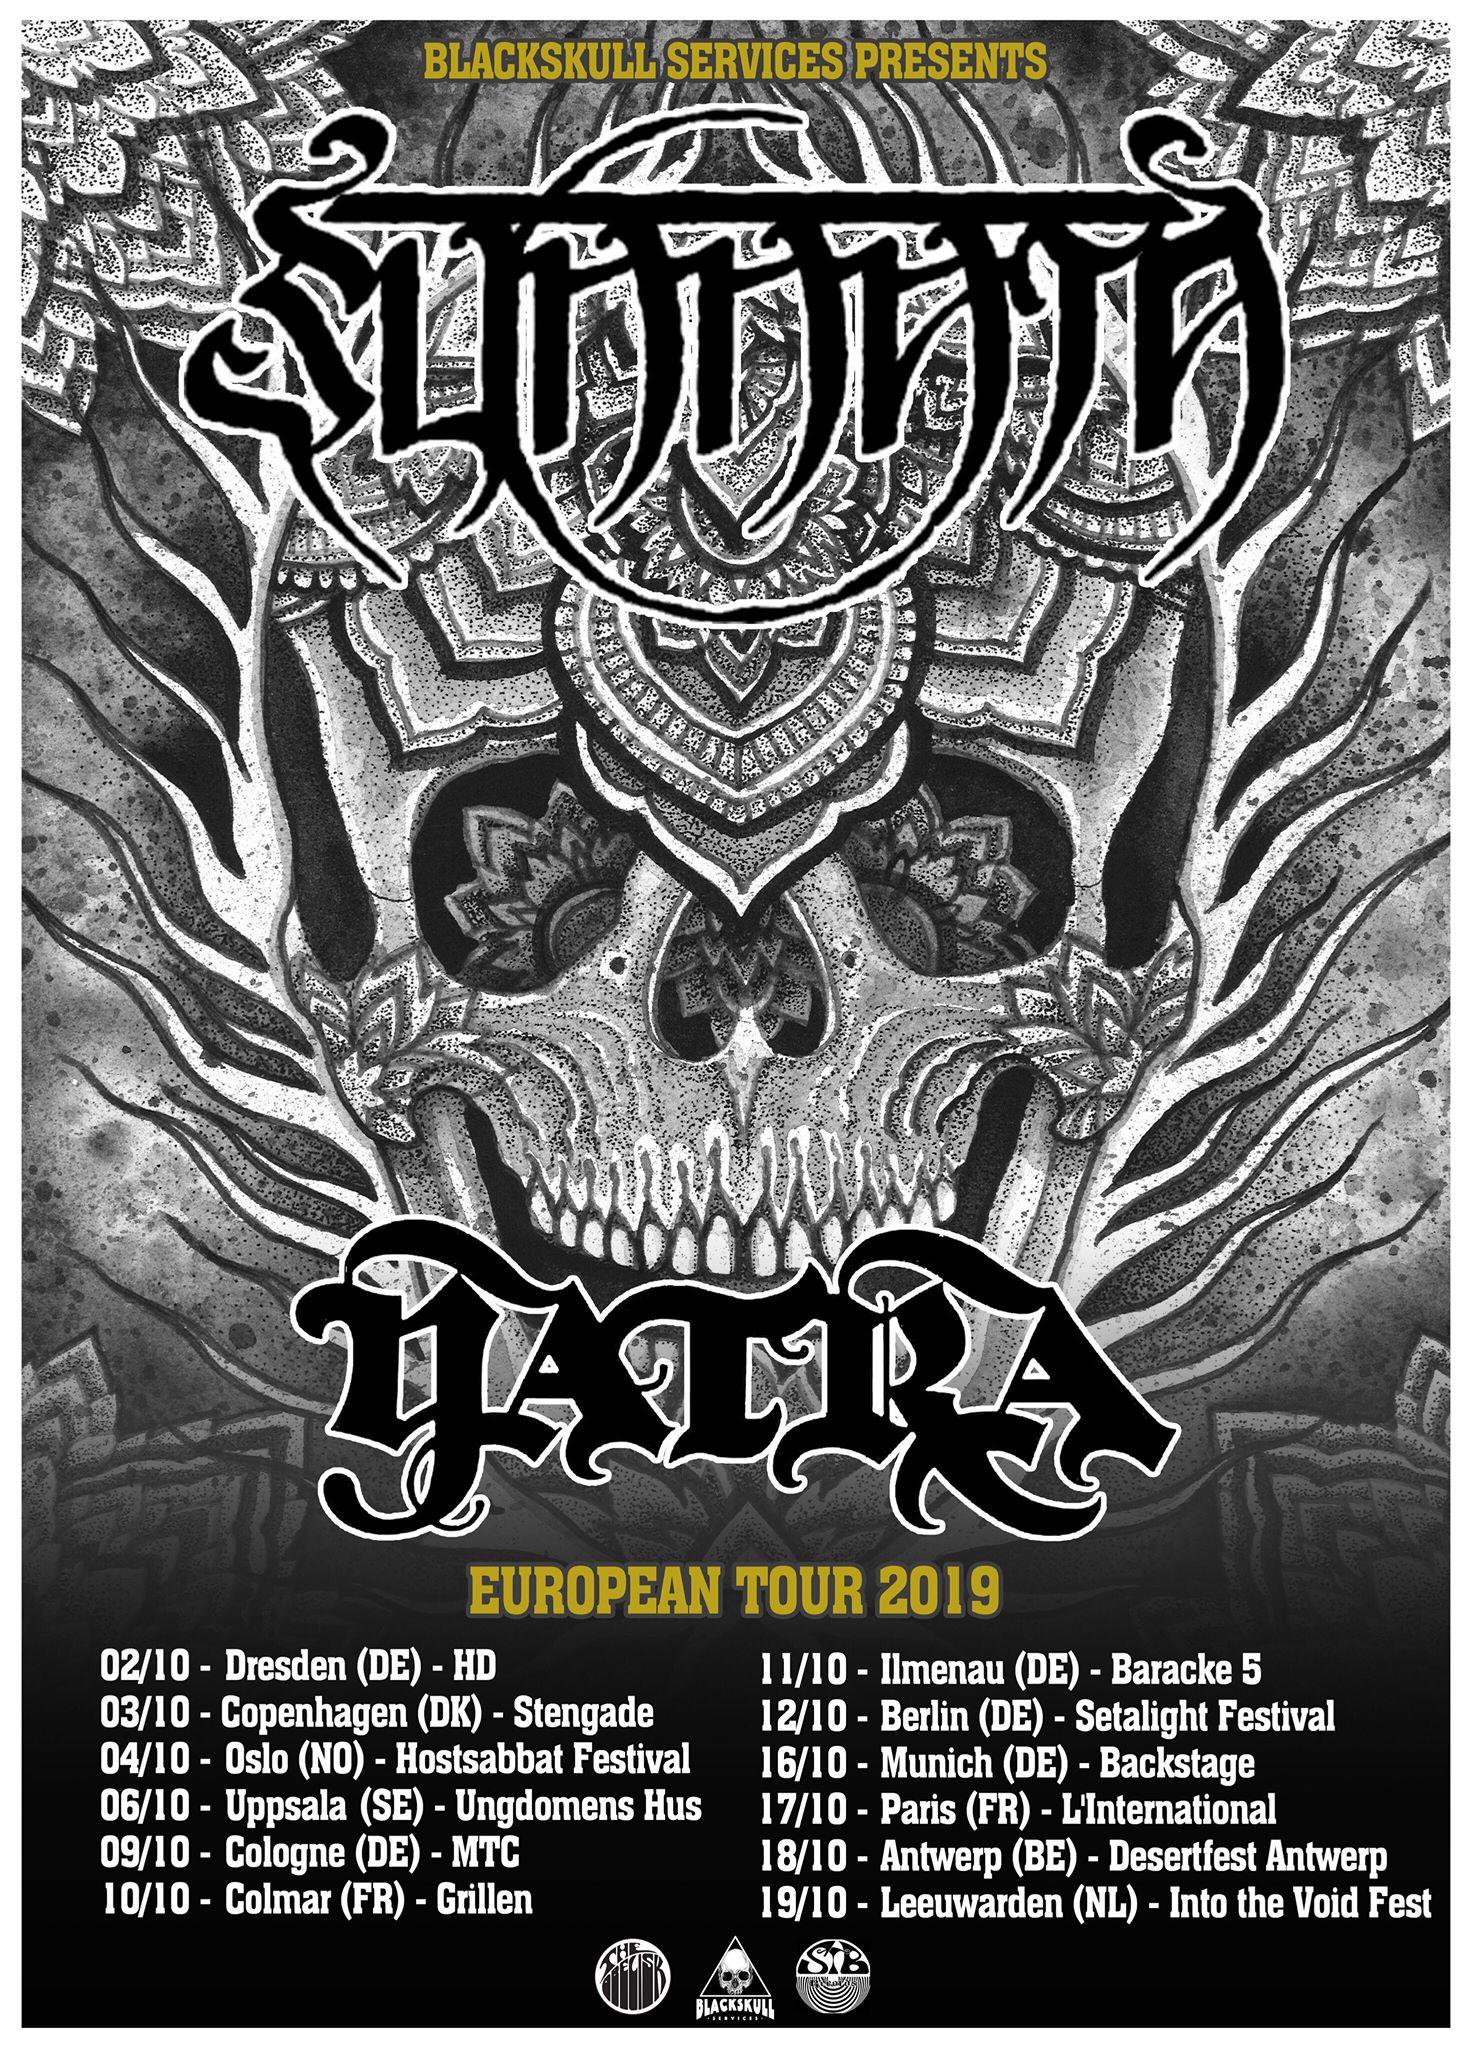 sunnata yatra tour poster